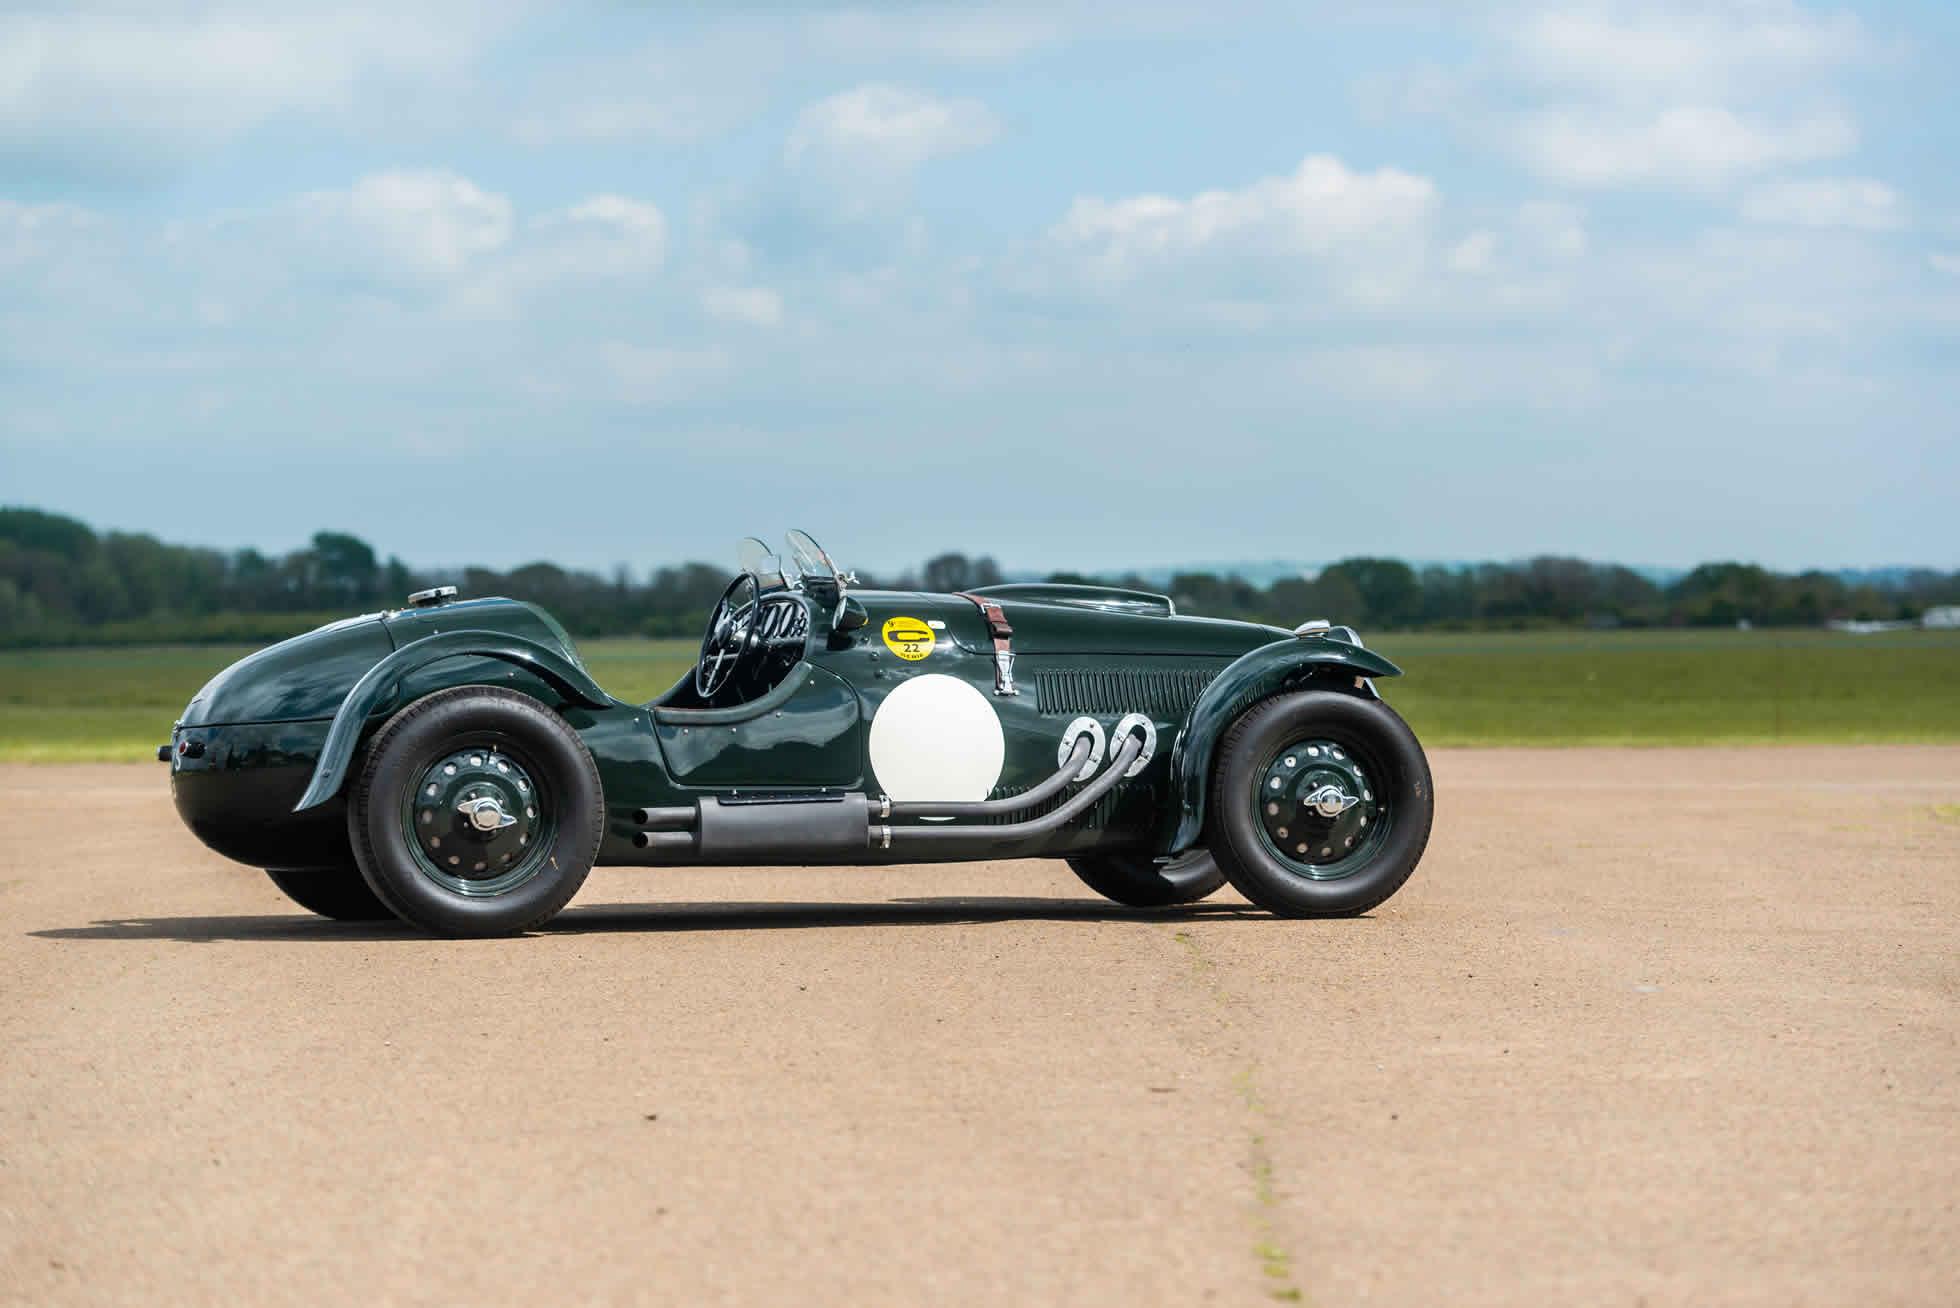 For sale 1951 Frazer Nash Le Mans Replica Mk 1, Sports Purpose Bicester Heritage, side